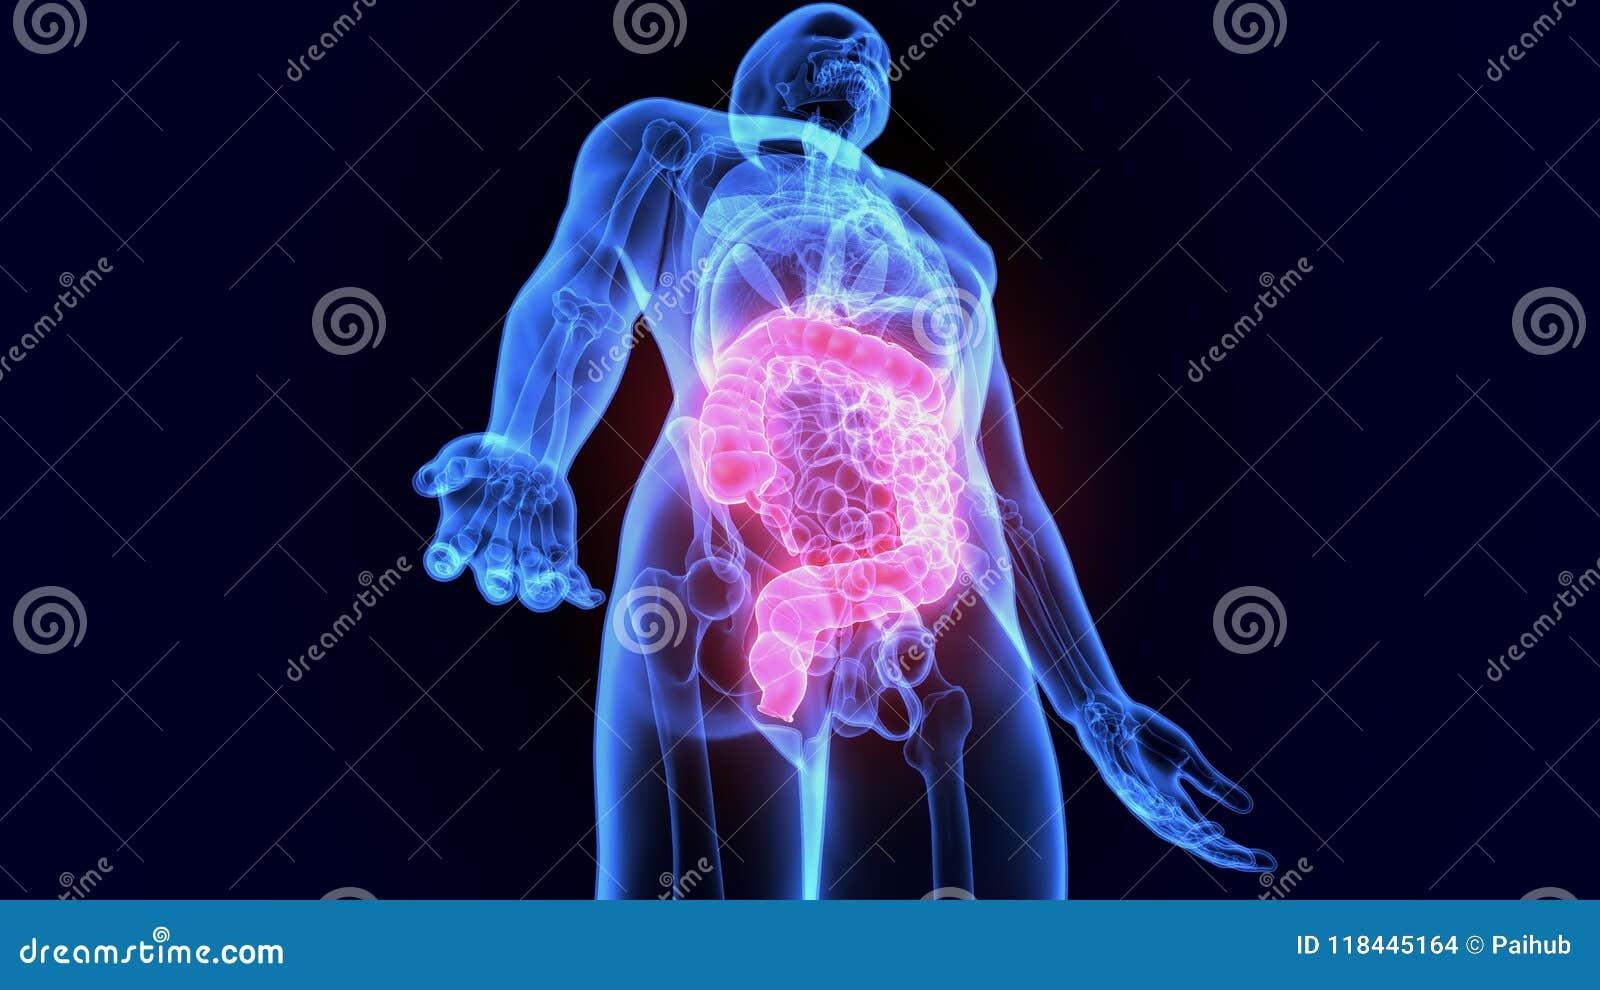 3d Illustration Of Human Digestive System Anatomy Large Intestine